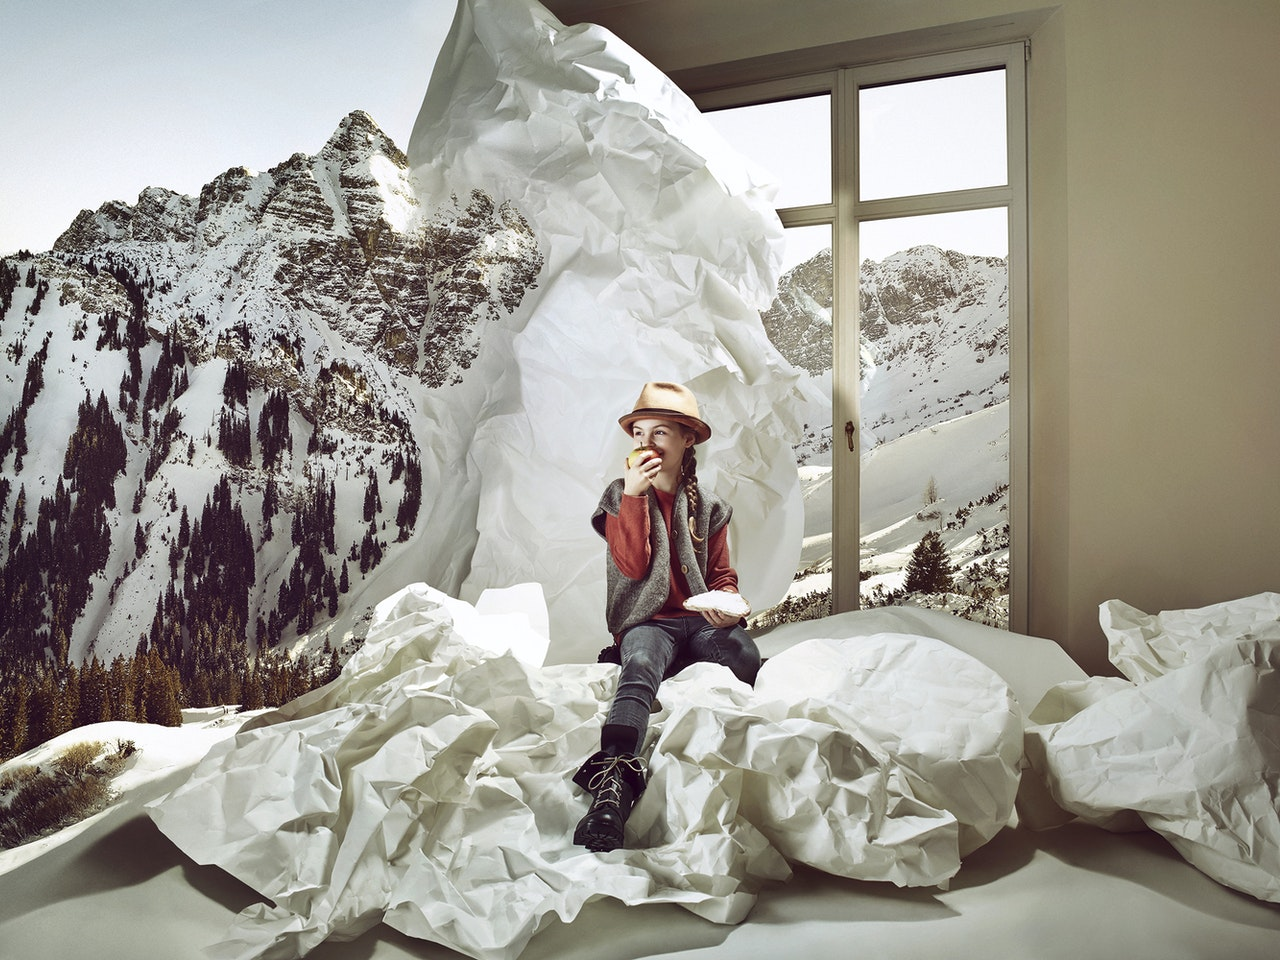 Conceptual - IM JETZT  /  Photographer: Claus Morgenstern